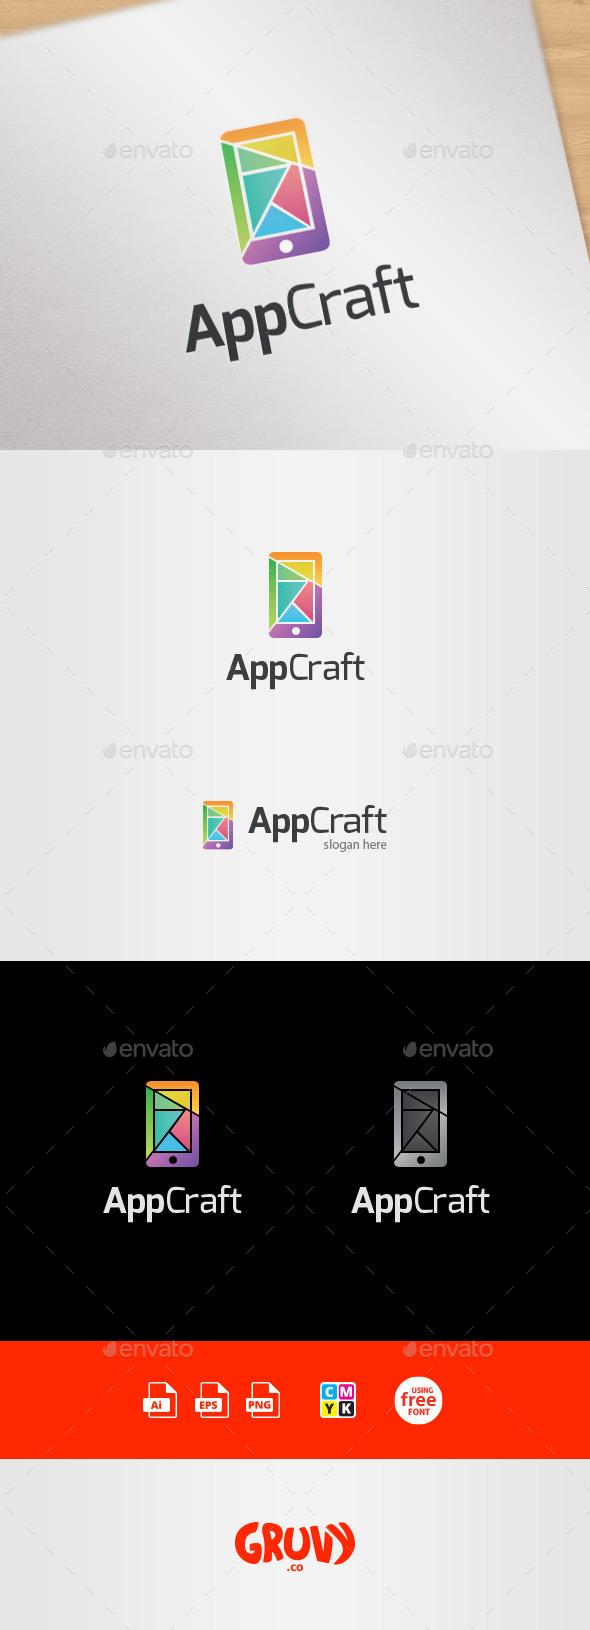 GraphicRiver AppCraft Mobile App Design Logo Template 9007325